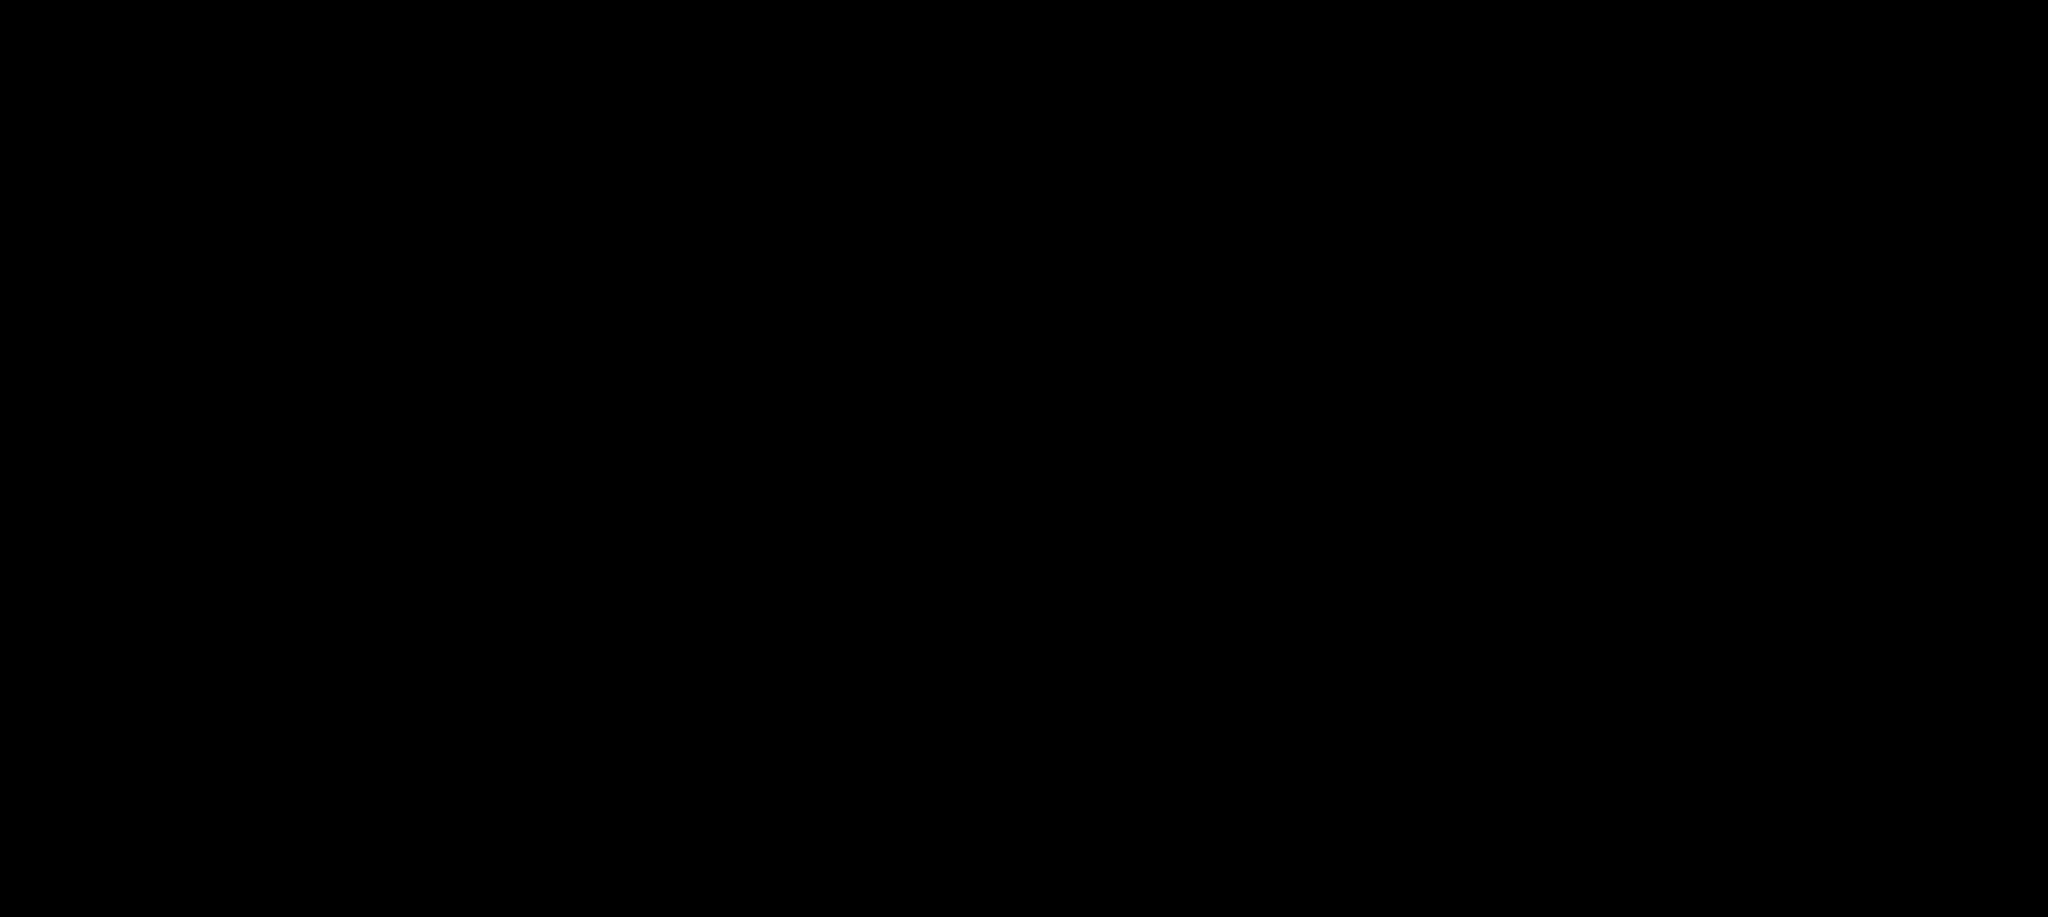 SCHOCK SIGNUS D-200 Magma